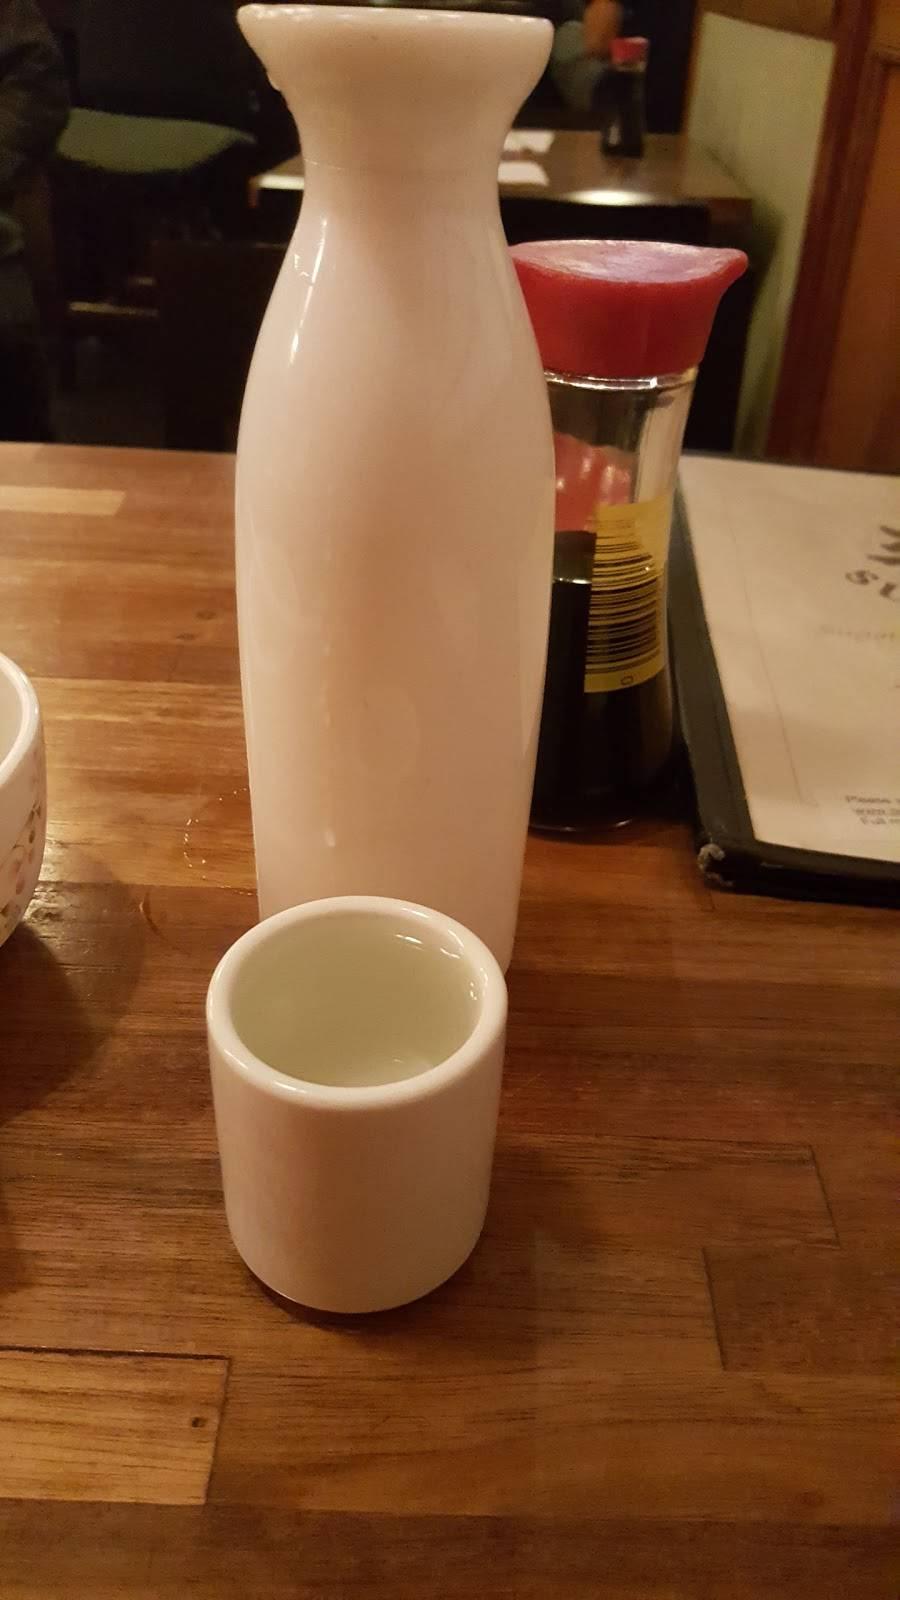 Sugata Japanese Restaurant | restaurant | 1105 Solano Ave, Albany, CA 94706, USA | 5105263516 OR +1 510-526-3516